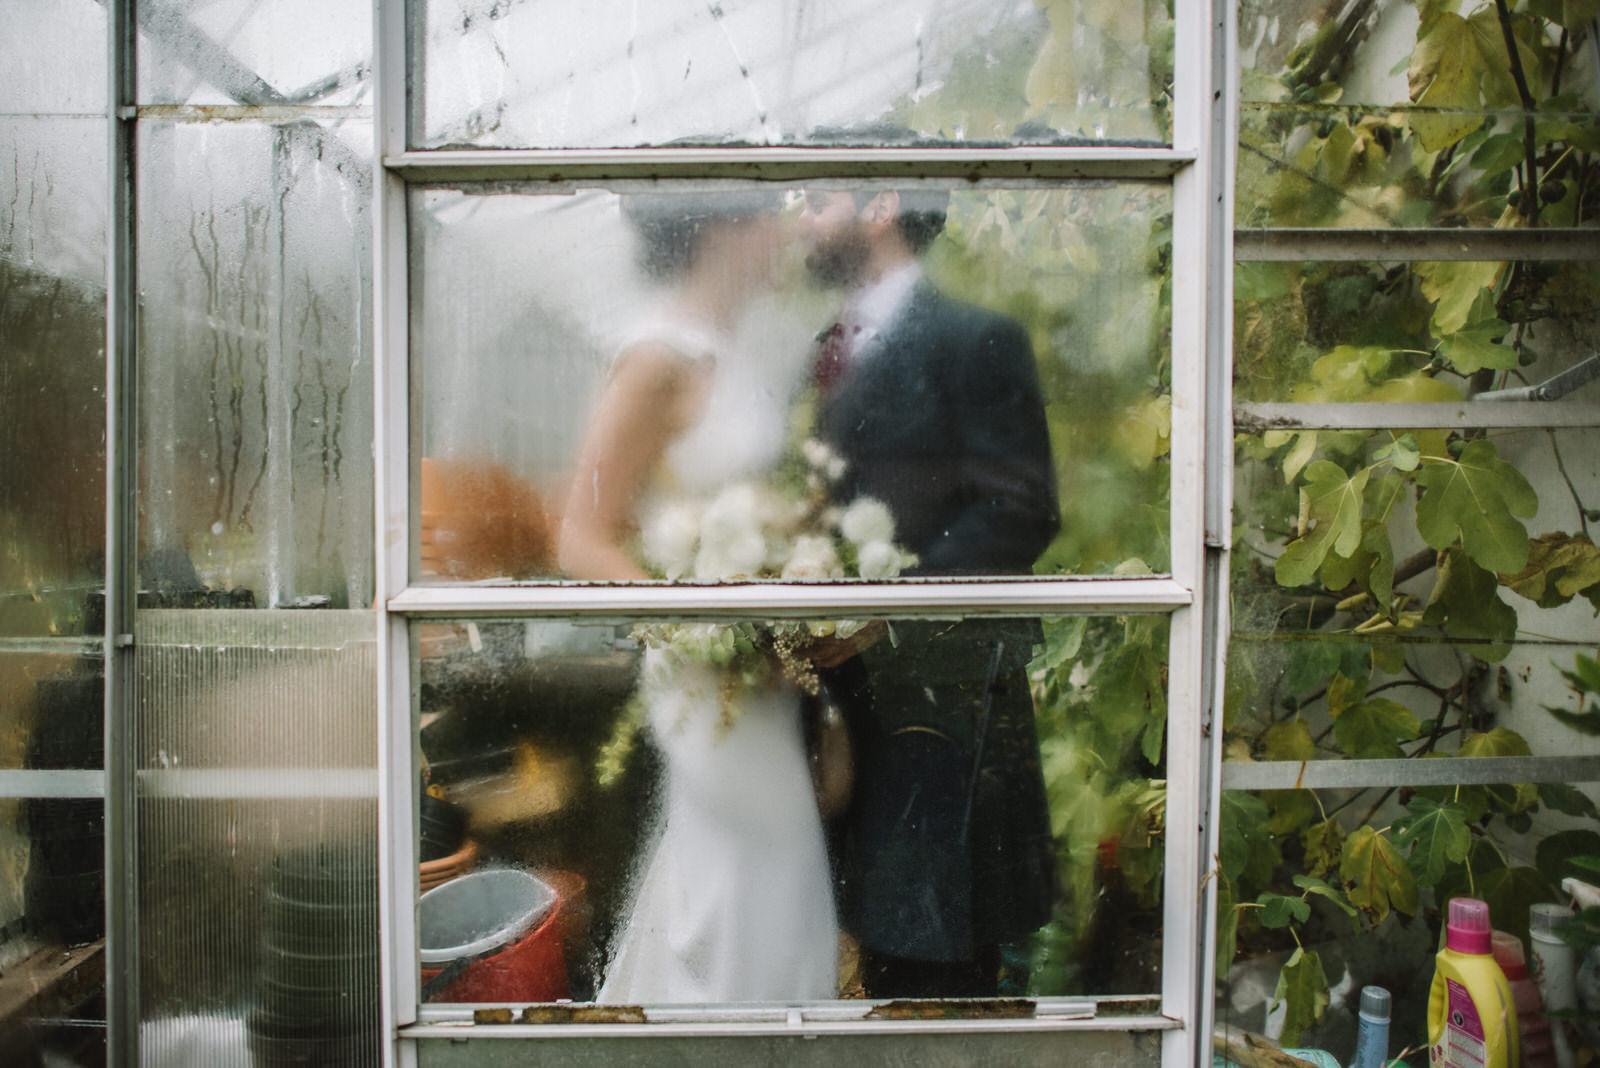 027-COLSTOUN-HOUSE-WEDDING-ALTERNATIVE-WEDDING-PHOTOGRAPHER-GLASGOW-WEDDING-PHOTOGRAPHER-STYLISH-SCOTTISH-WEDDING.JPG